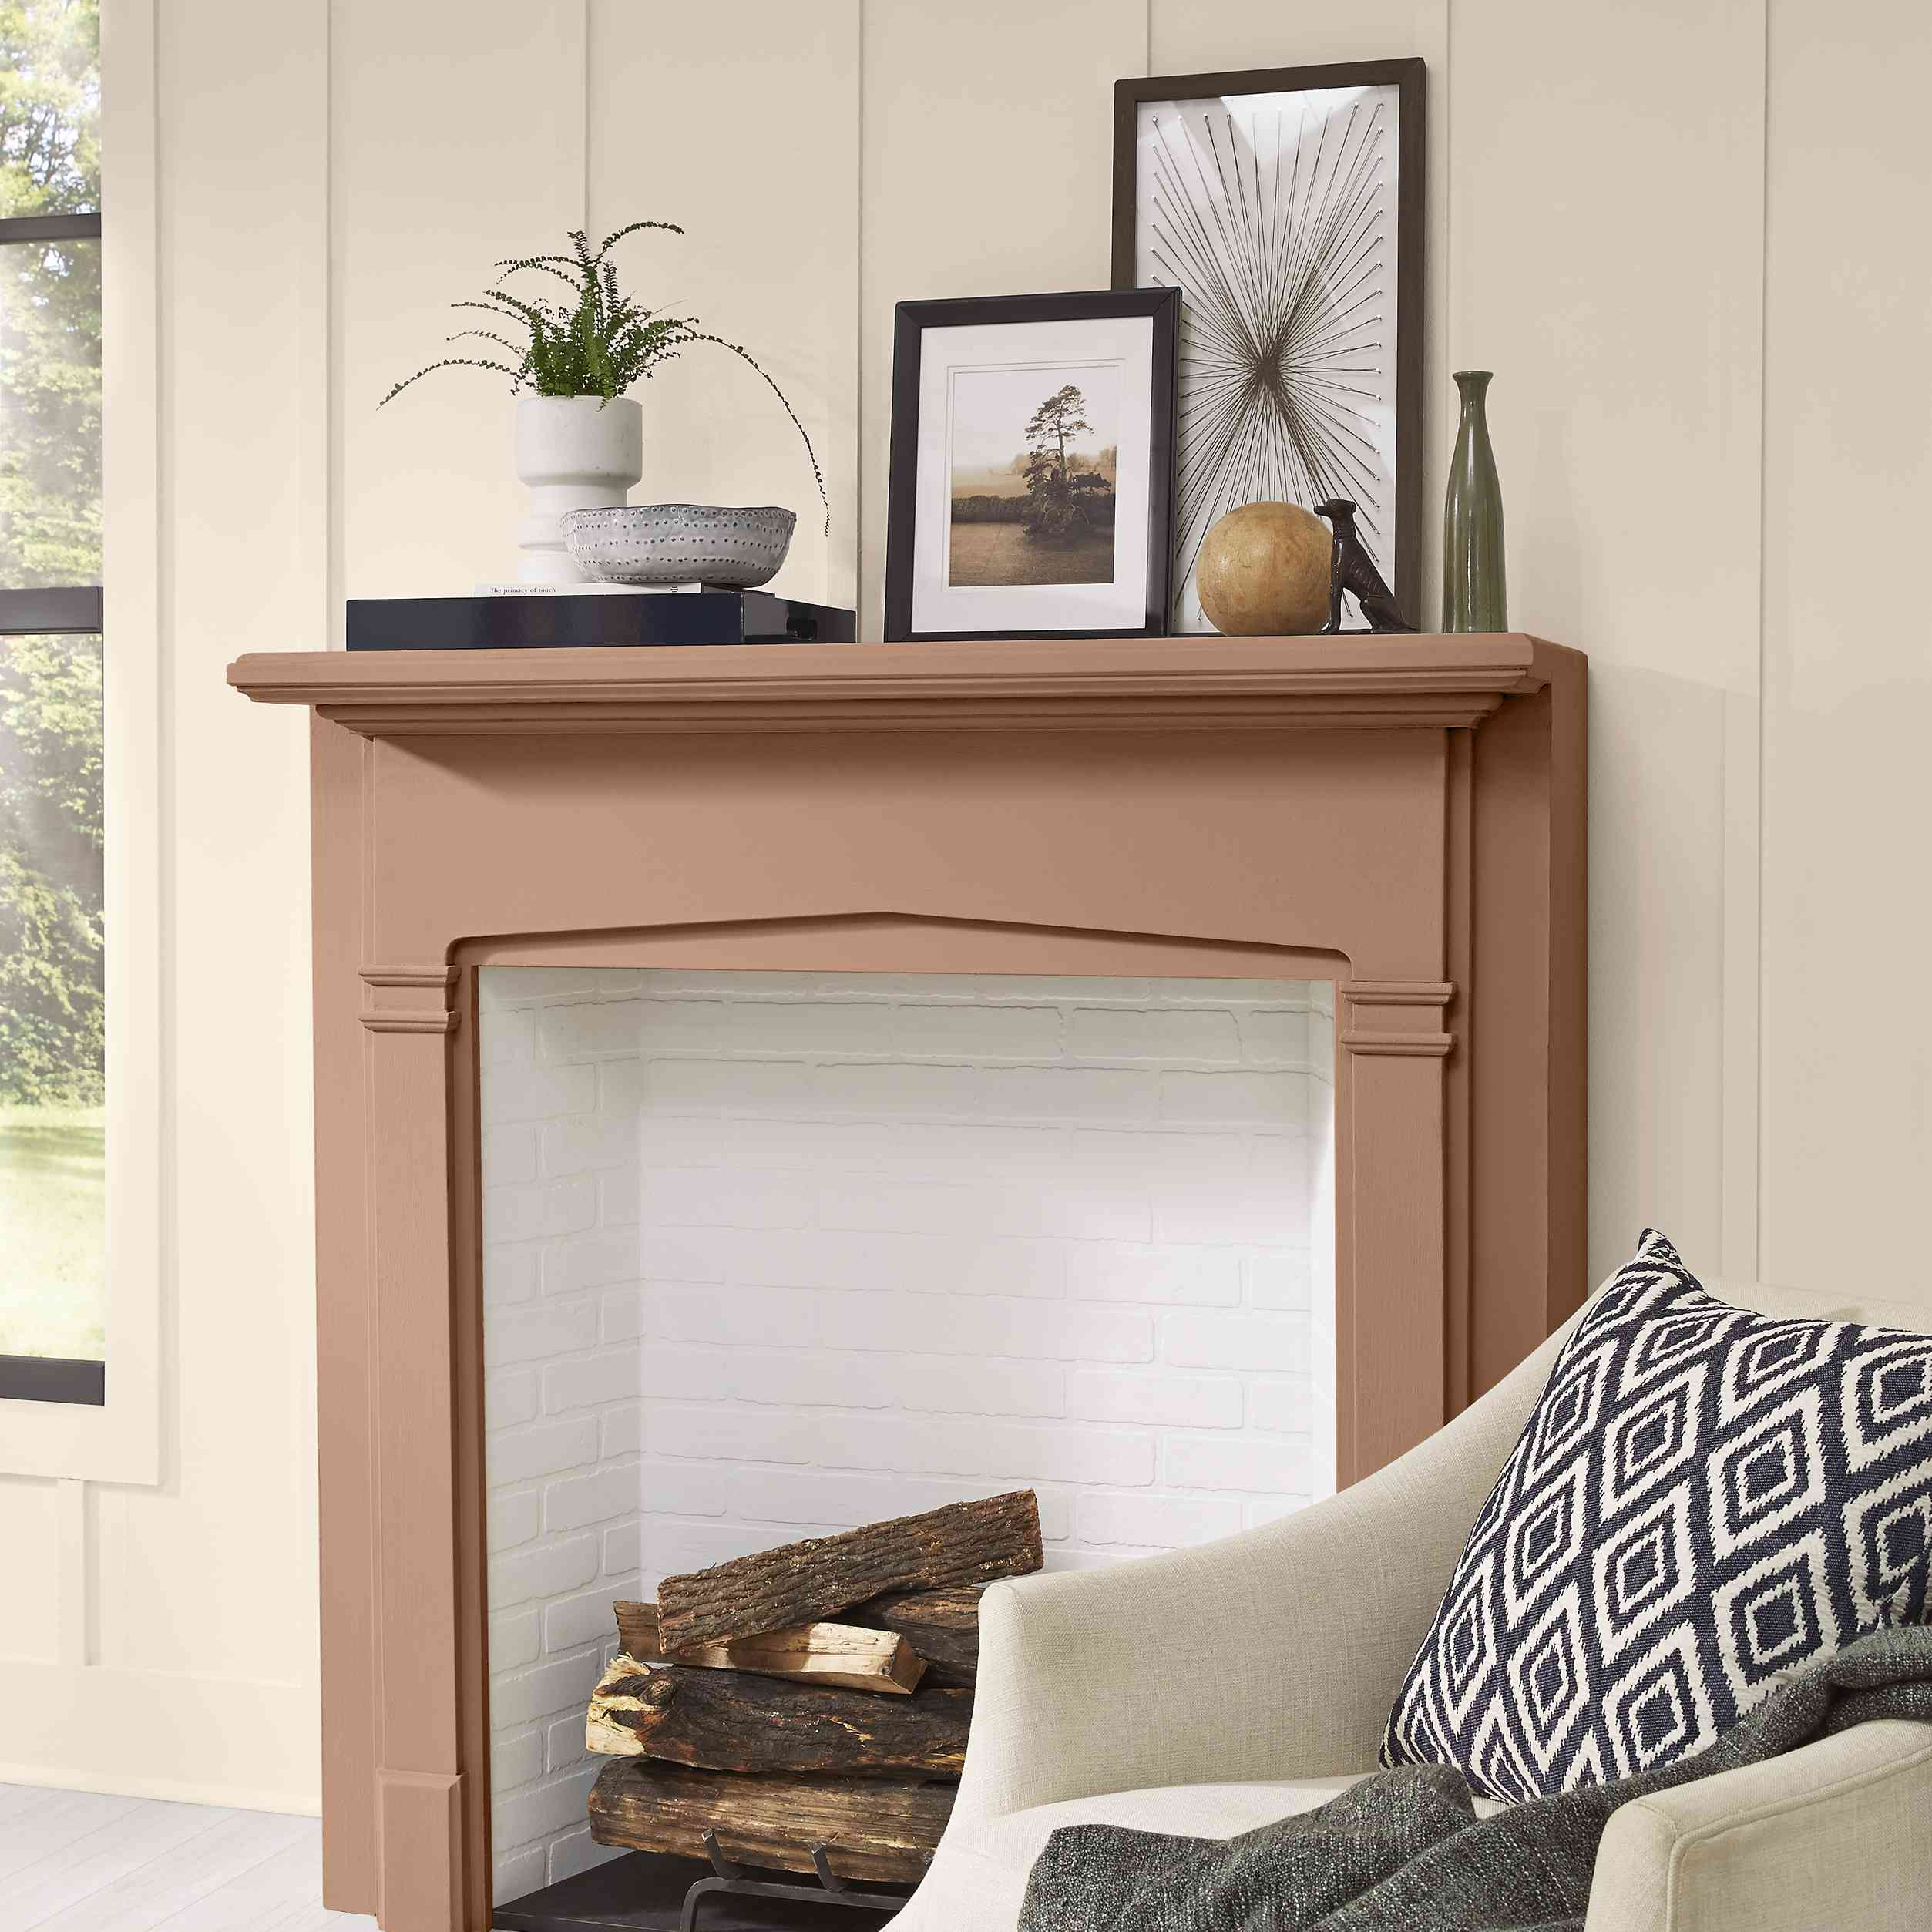 Fireplace mantel painted Canyon Dusk.